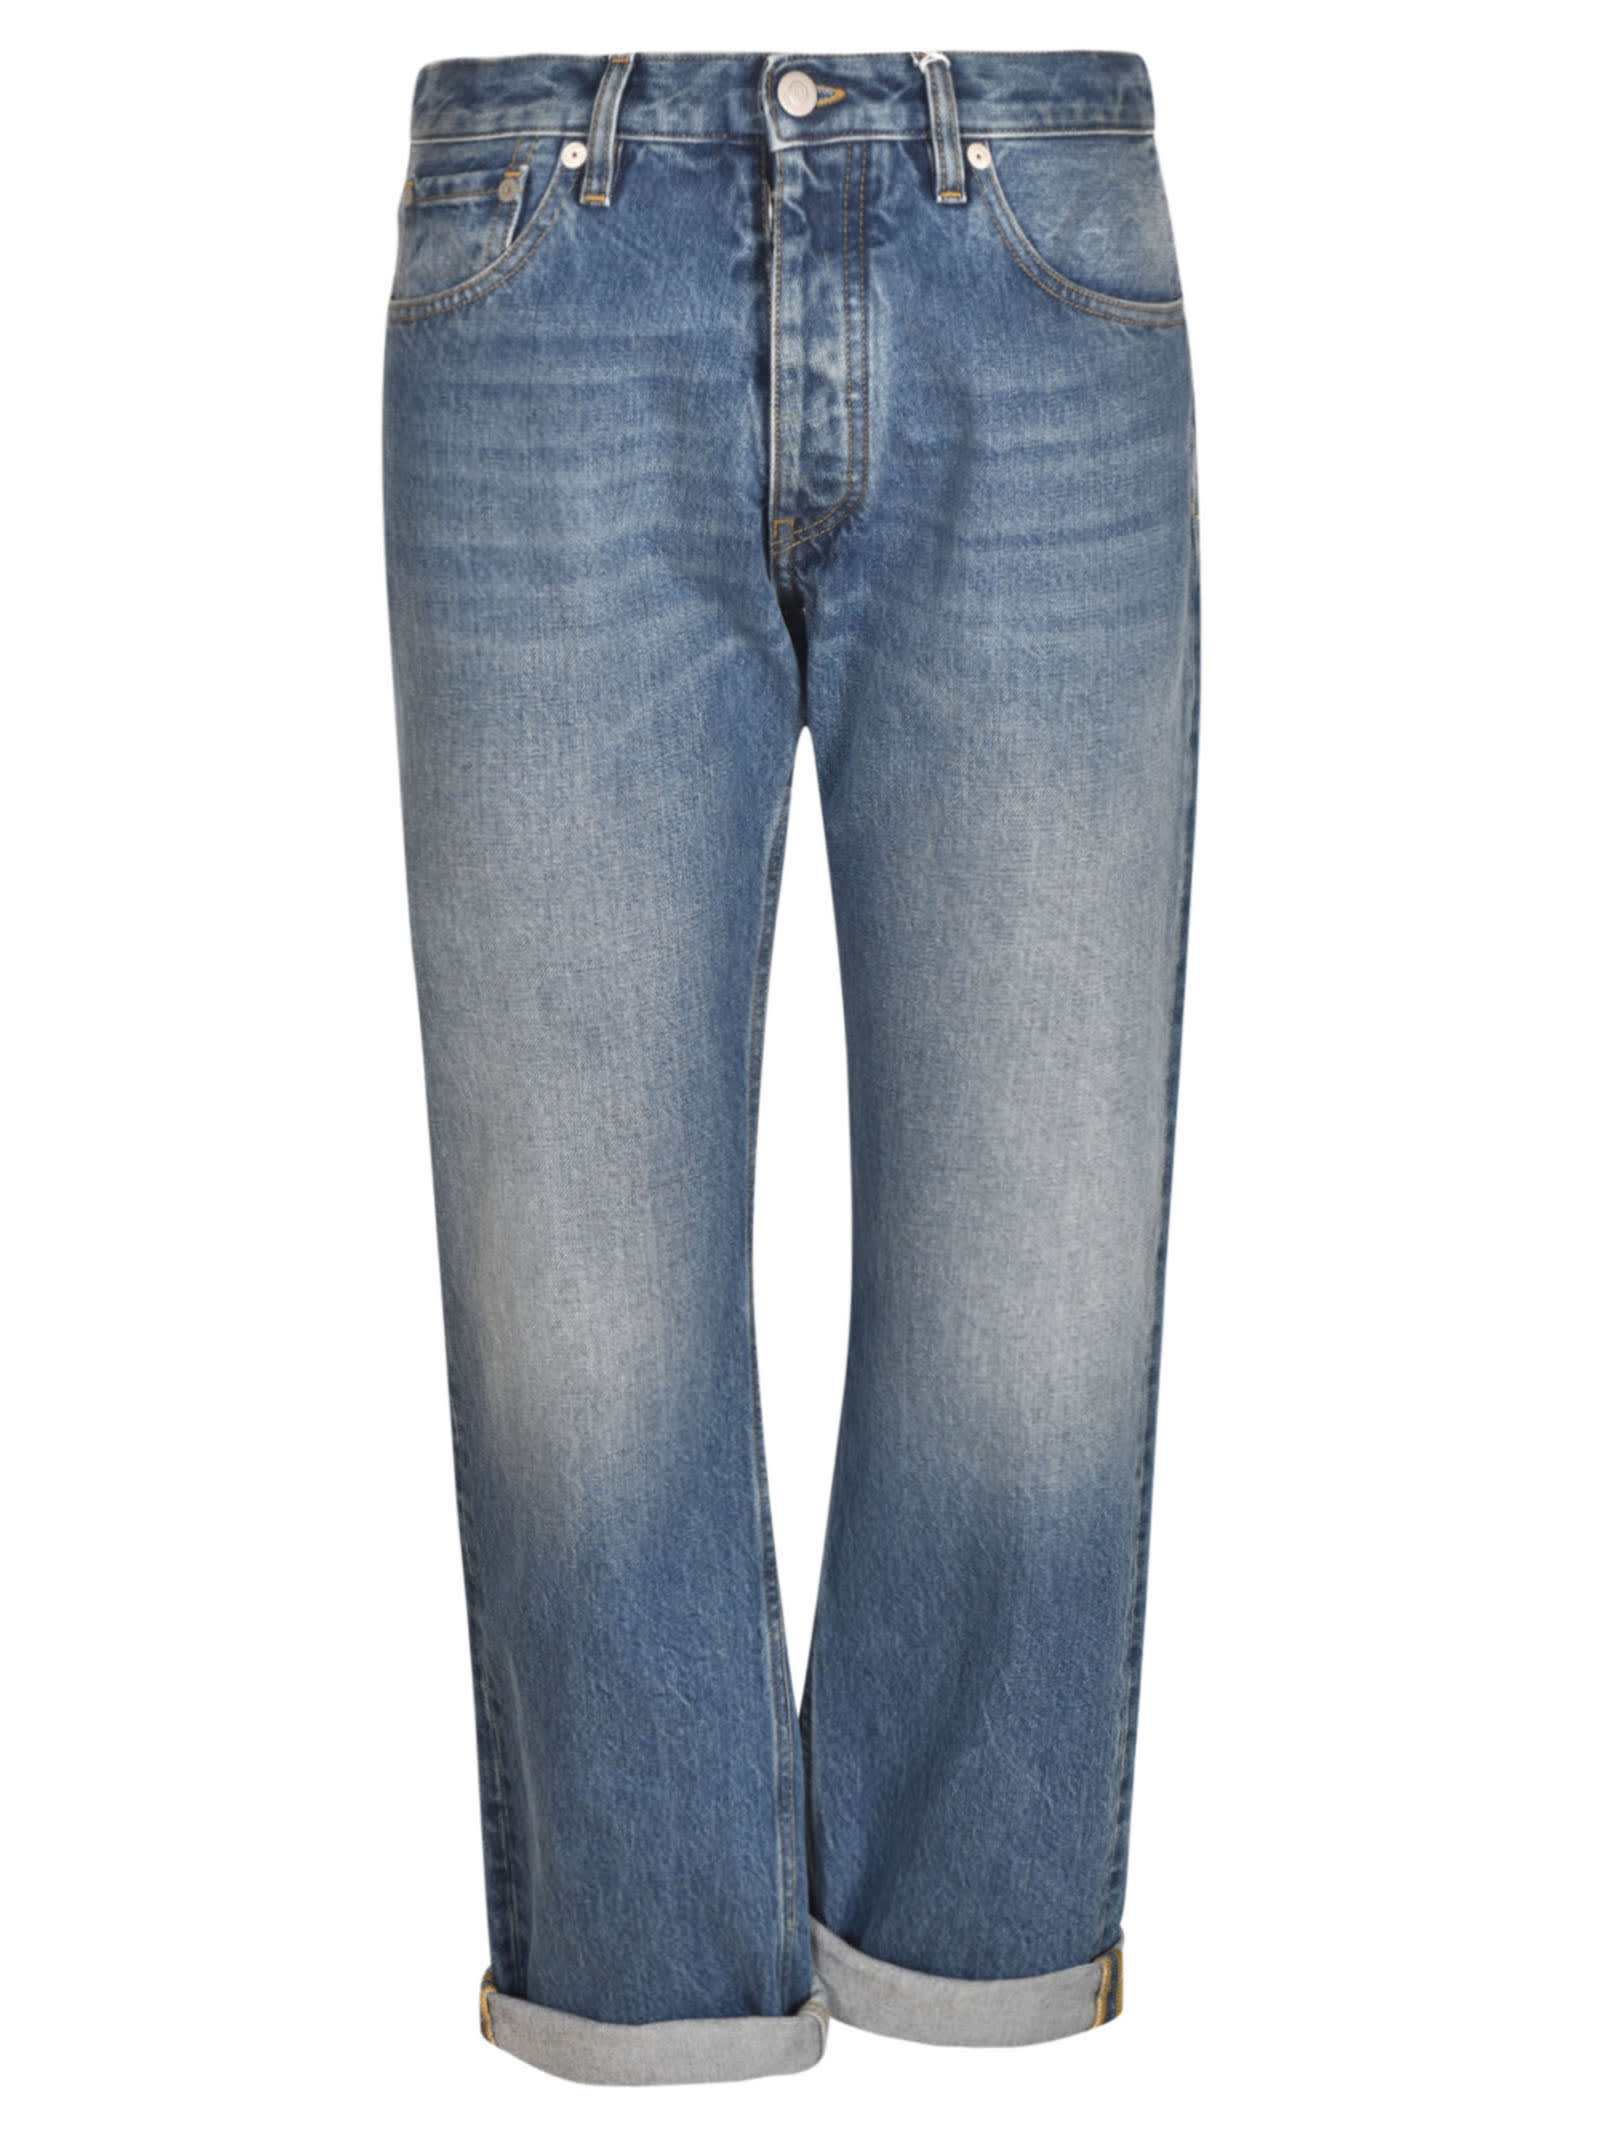 Maison Margiela Straight Jeans In Blue